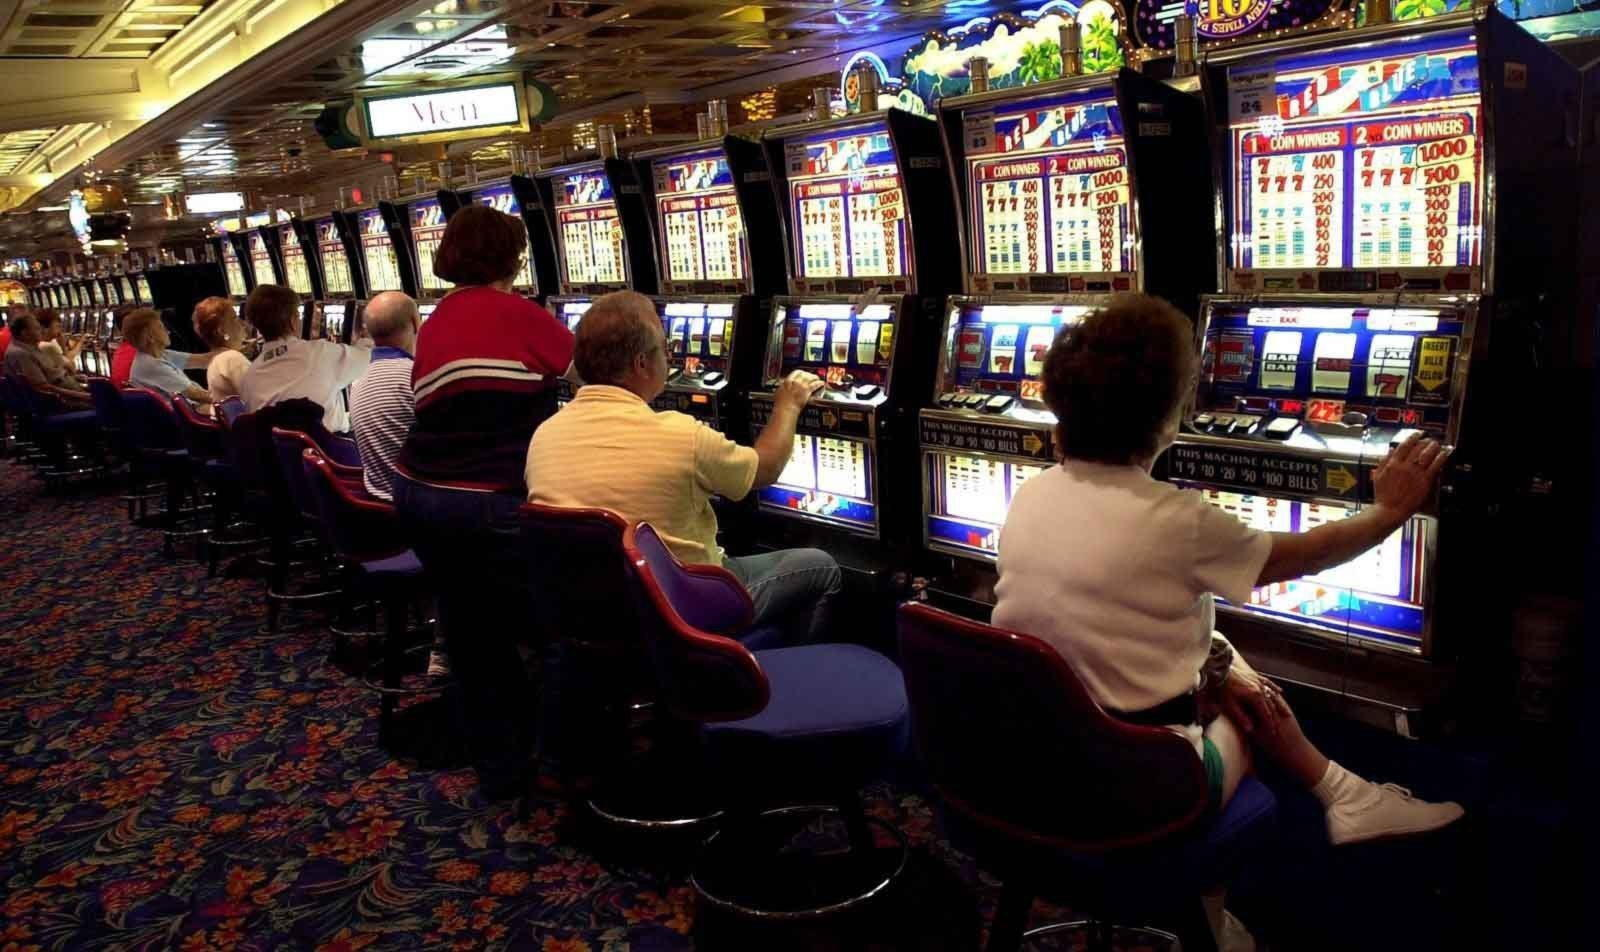 800% casino match bonus at Slots Cafe